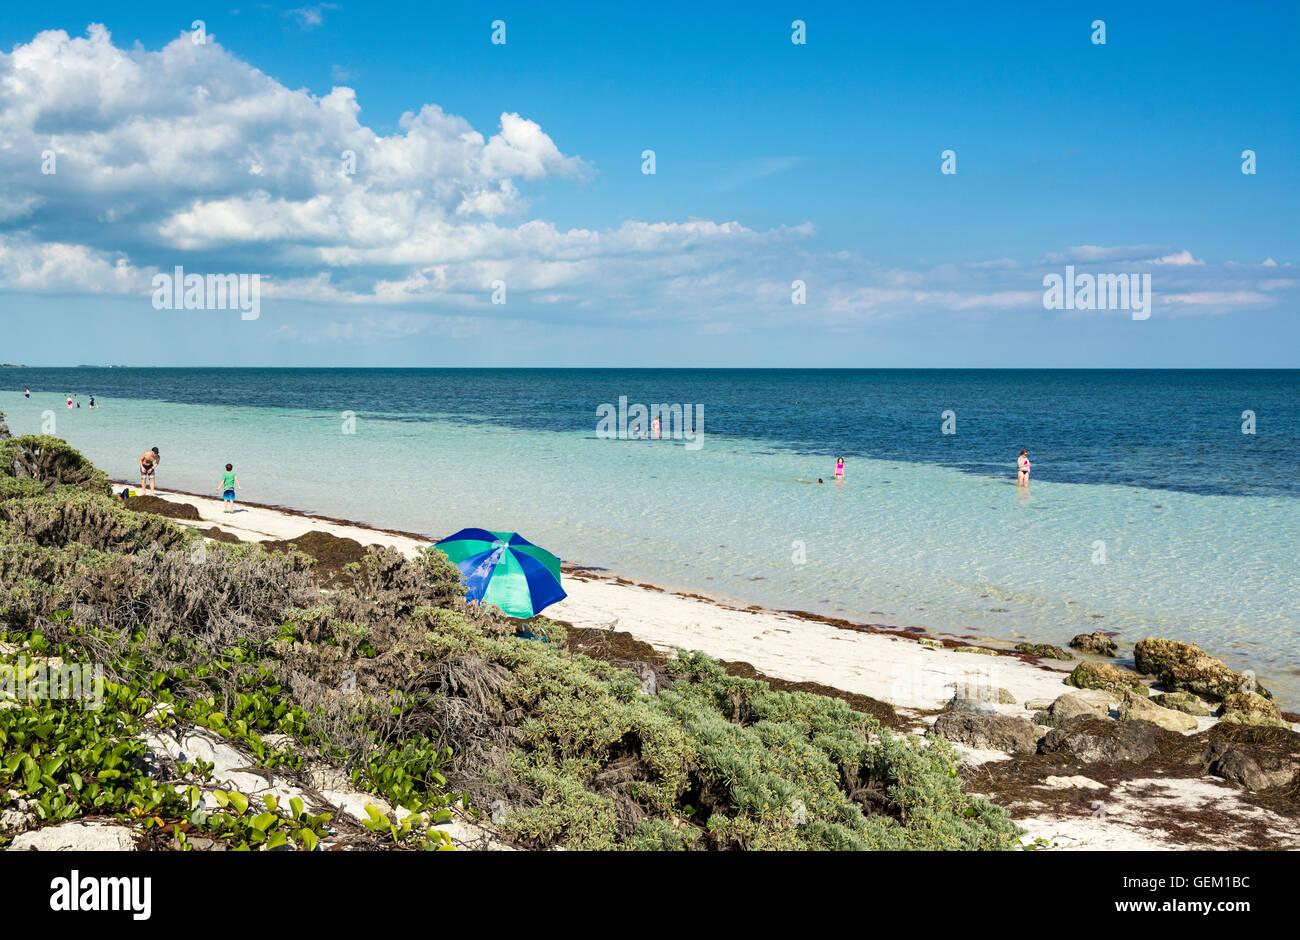 Florida, Bahia Honda State Park, Seagrass on beach - Stock Image